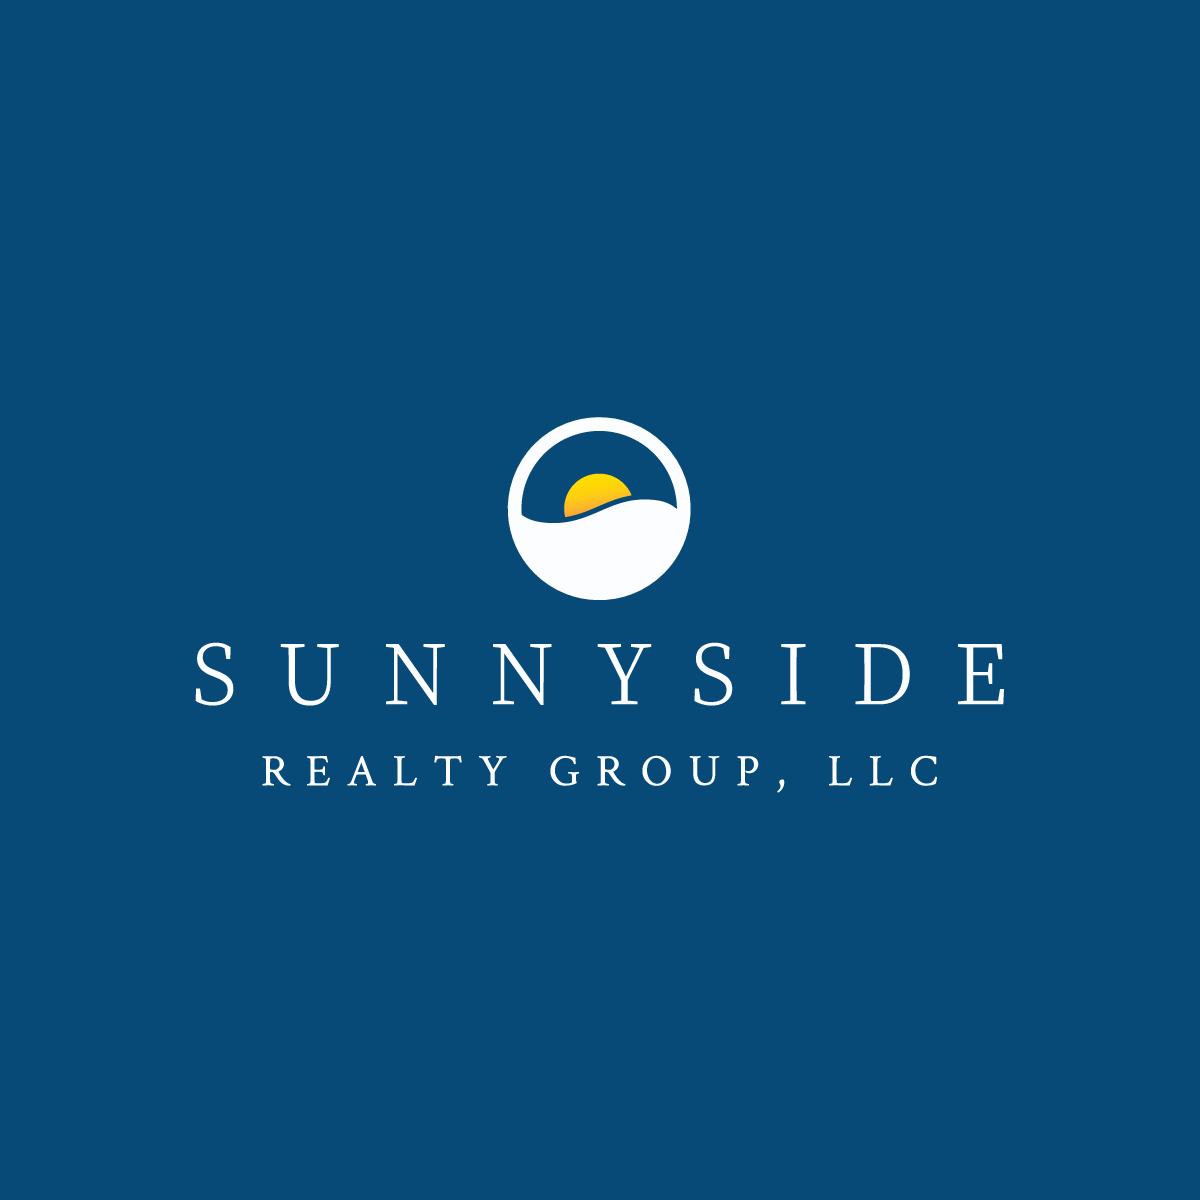 Sunnyside Realty logo against deep blue background.